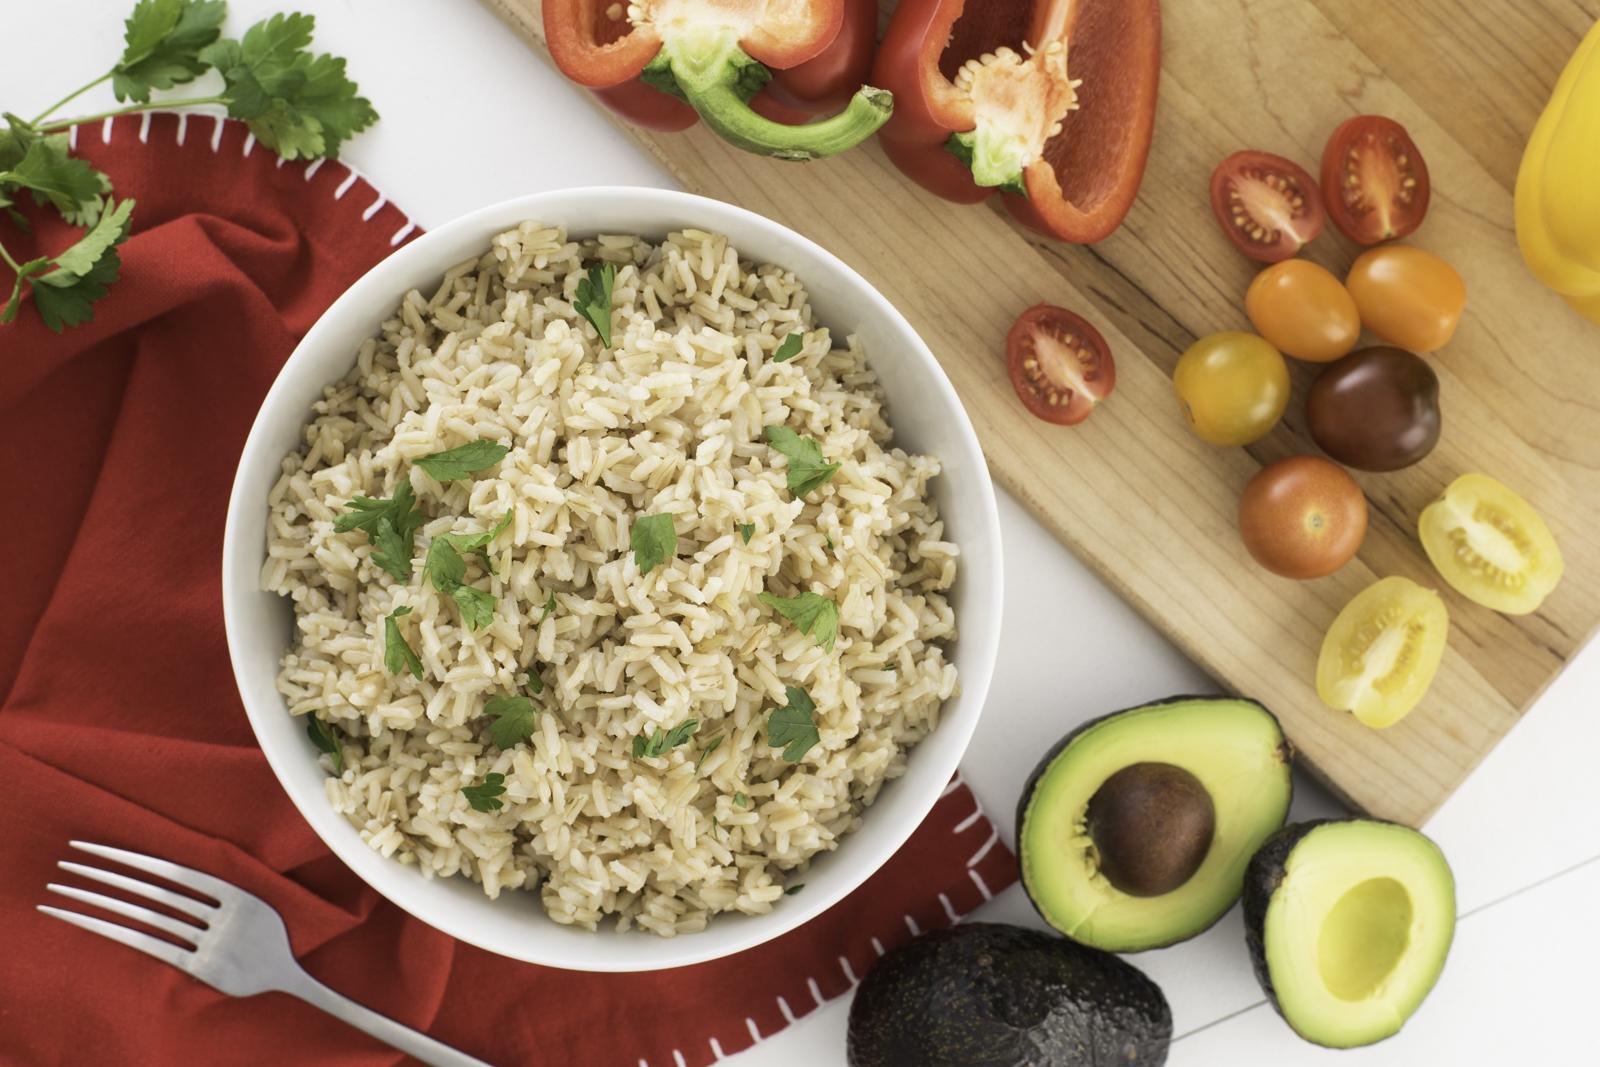 Brown Rice Campbells Less Sodium Chicken Broth